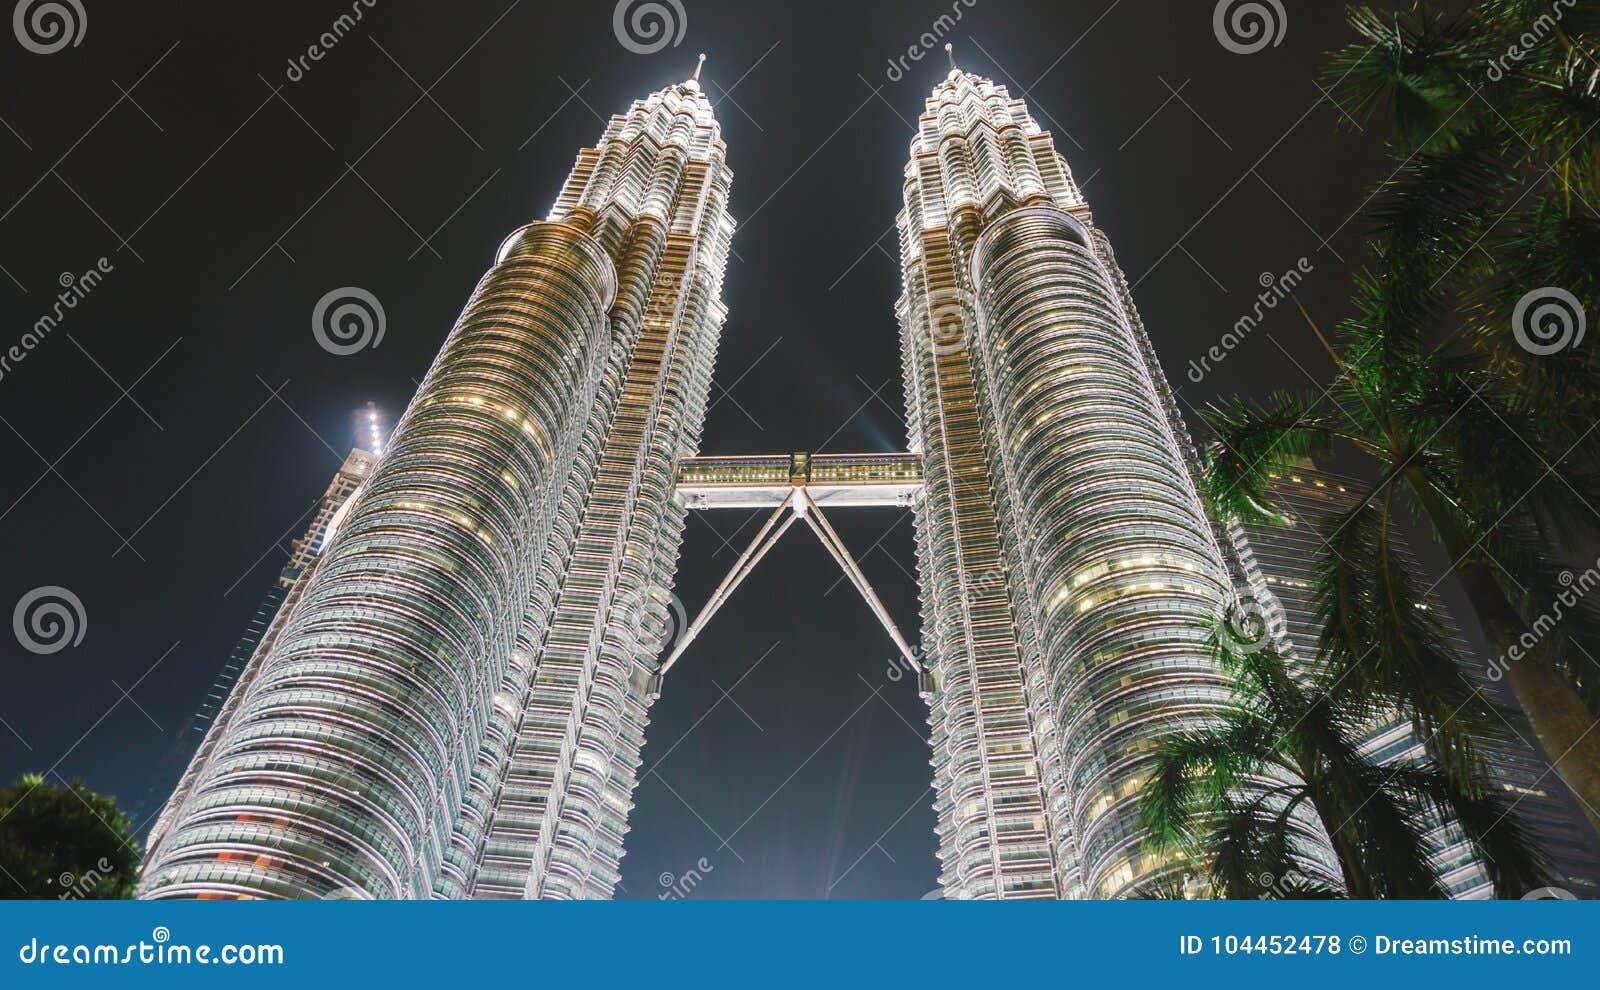 13 mai 2017 : Tours jumelles de Petronas la nuit en Kuala Lumpur, Malaisie